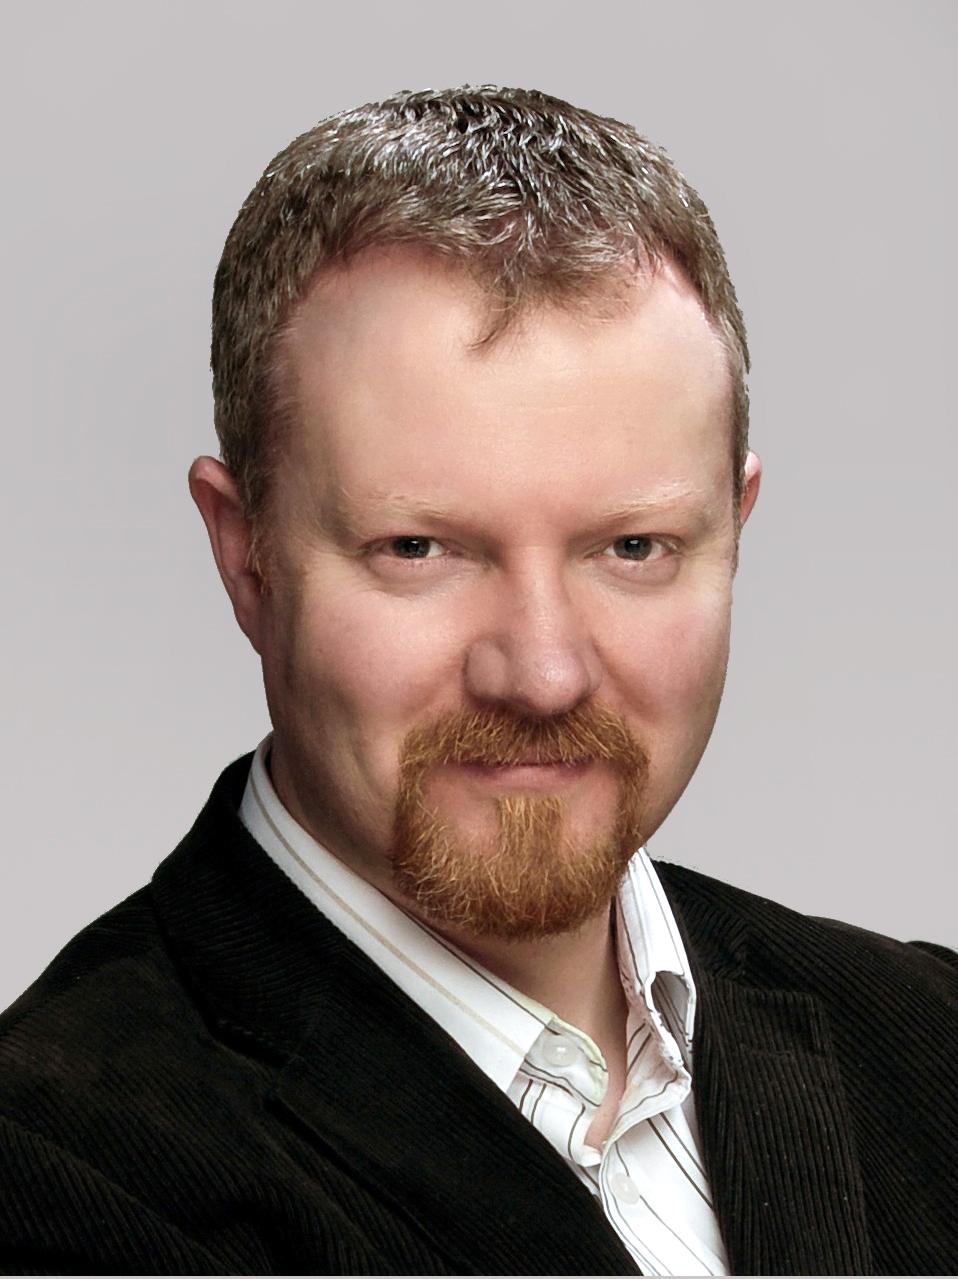 Glen_Mulcahy-newgrey.jpg